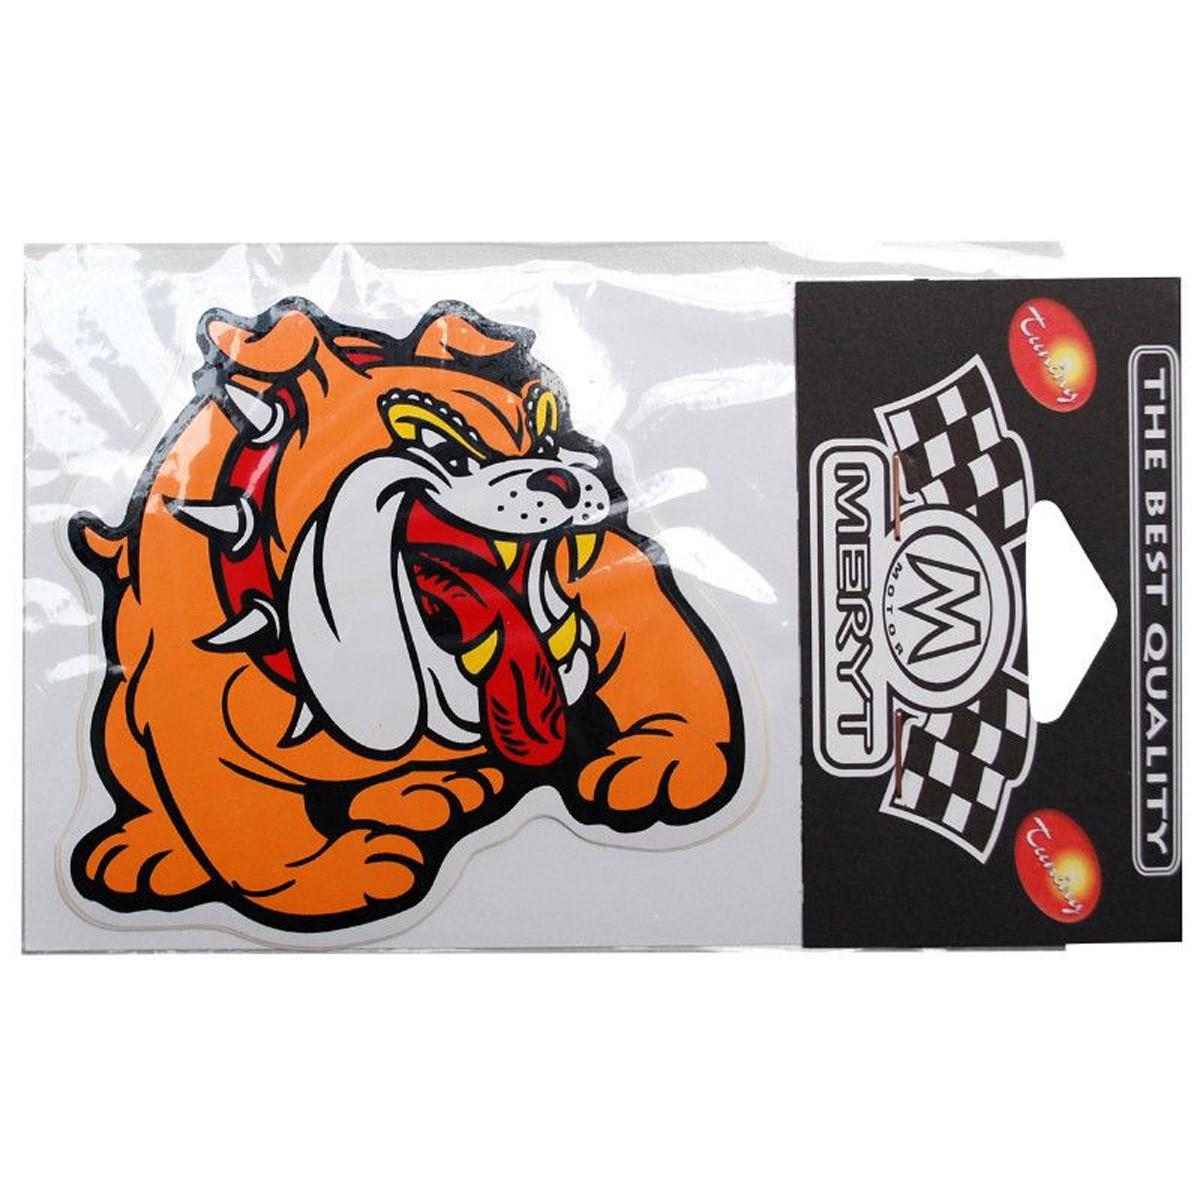 Autocollant / Sticker - MERYT Bulldog Grand 10 x 10.5cm